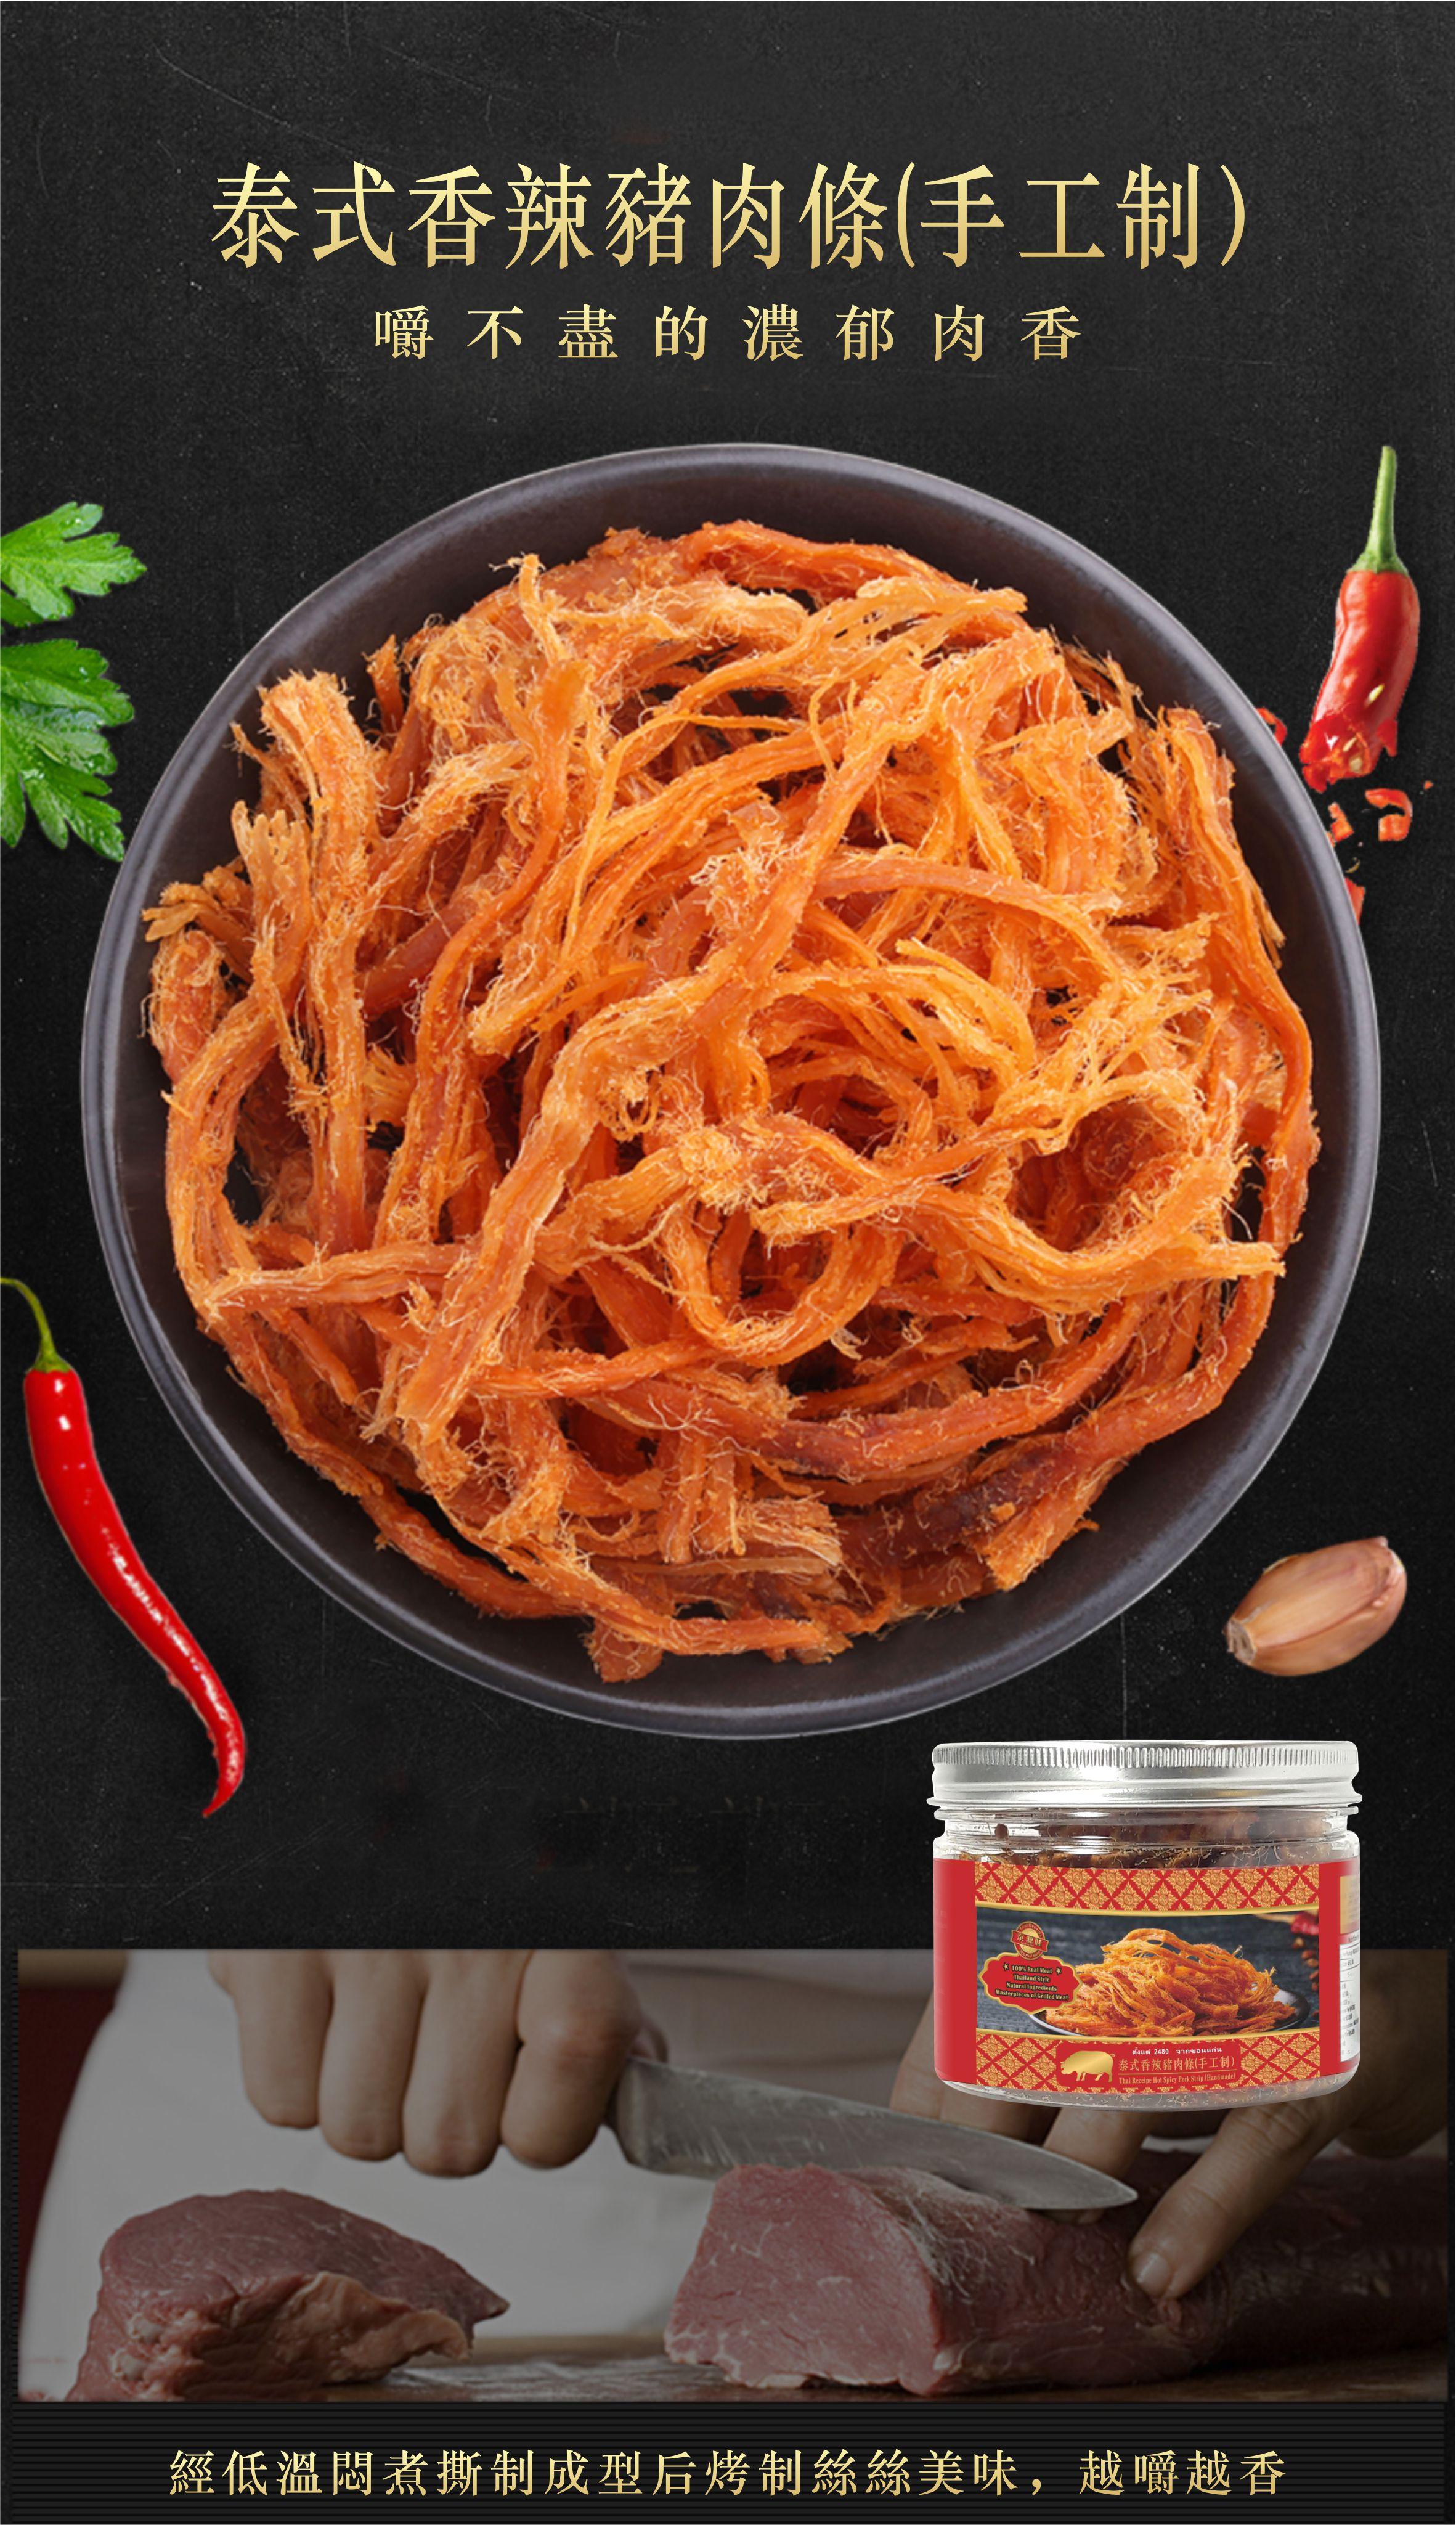 Thai Receipe | Thai Receipe Hot Spicy Pork Strip (Handmade